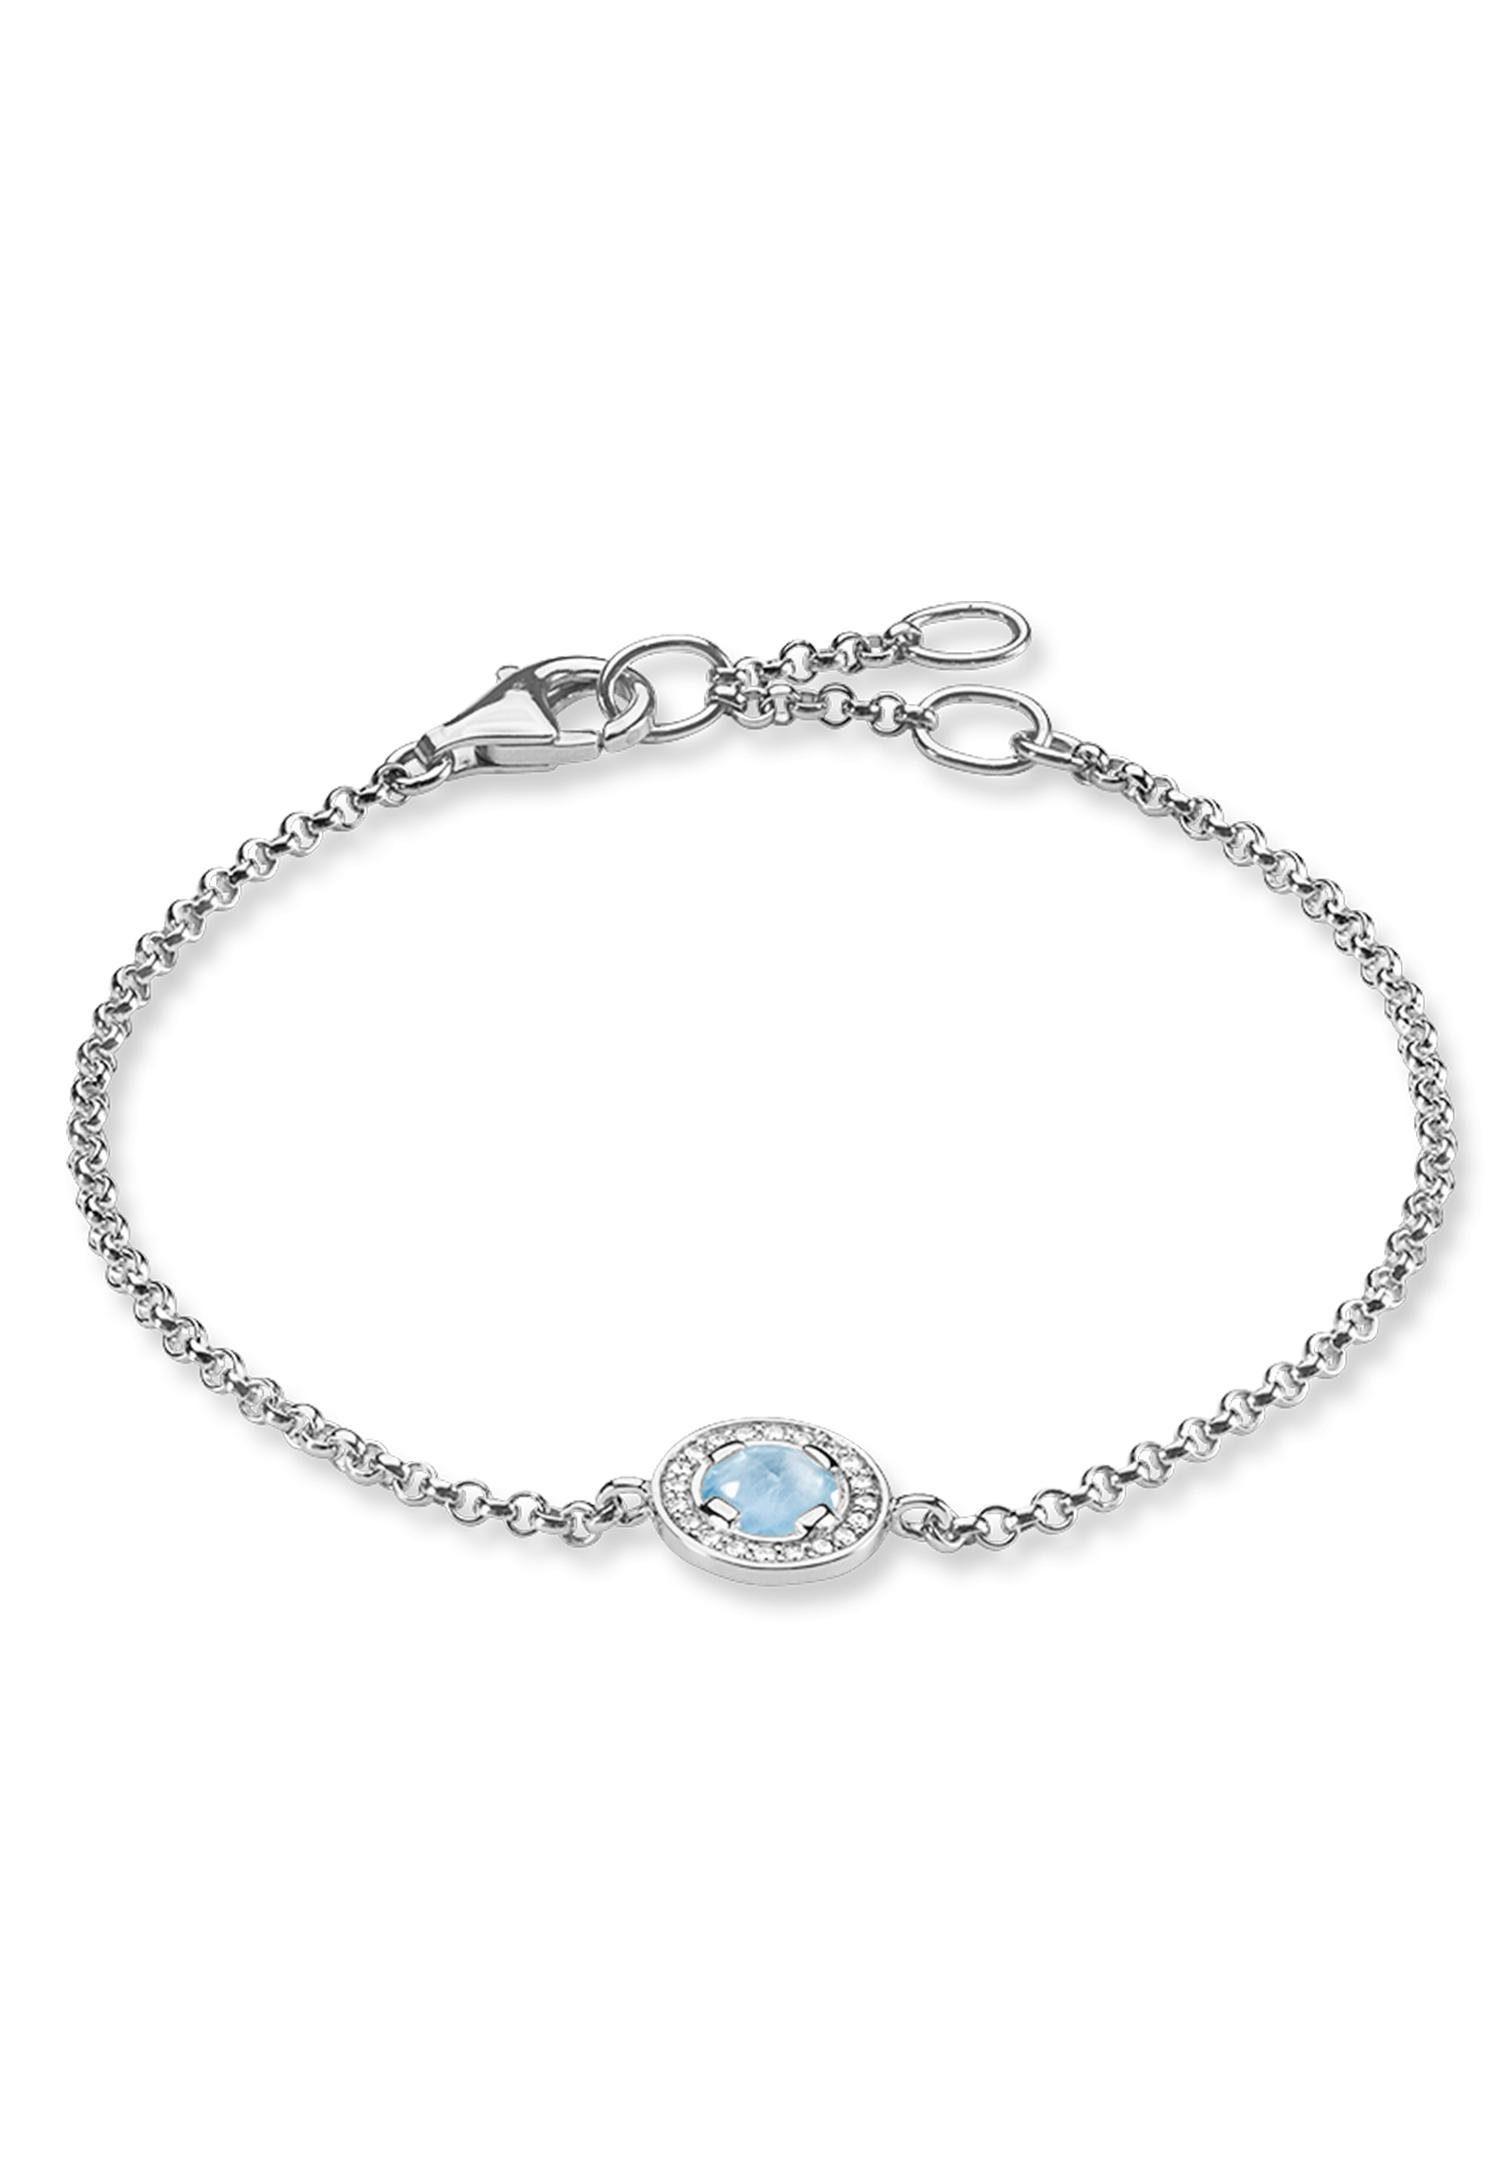 THOMAS SABO Silberarmband »Light of Luna Hellblau, A1334-694-31-L19,5v« mit Zirkonia und Aquamarin